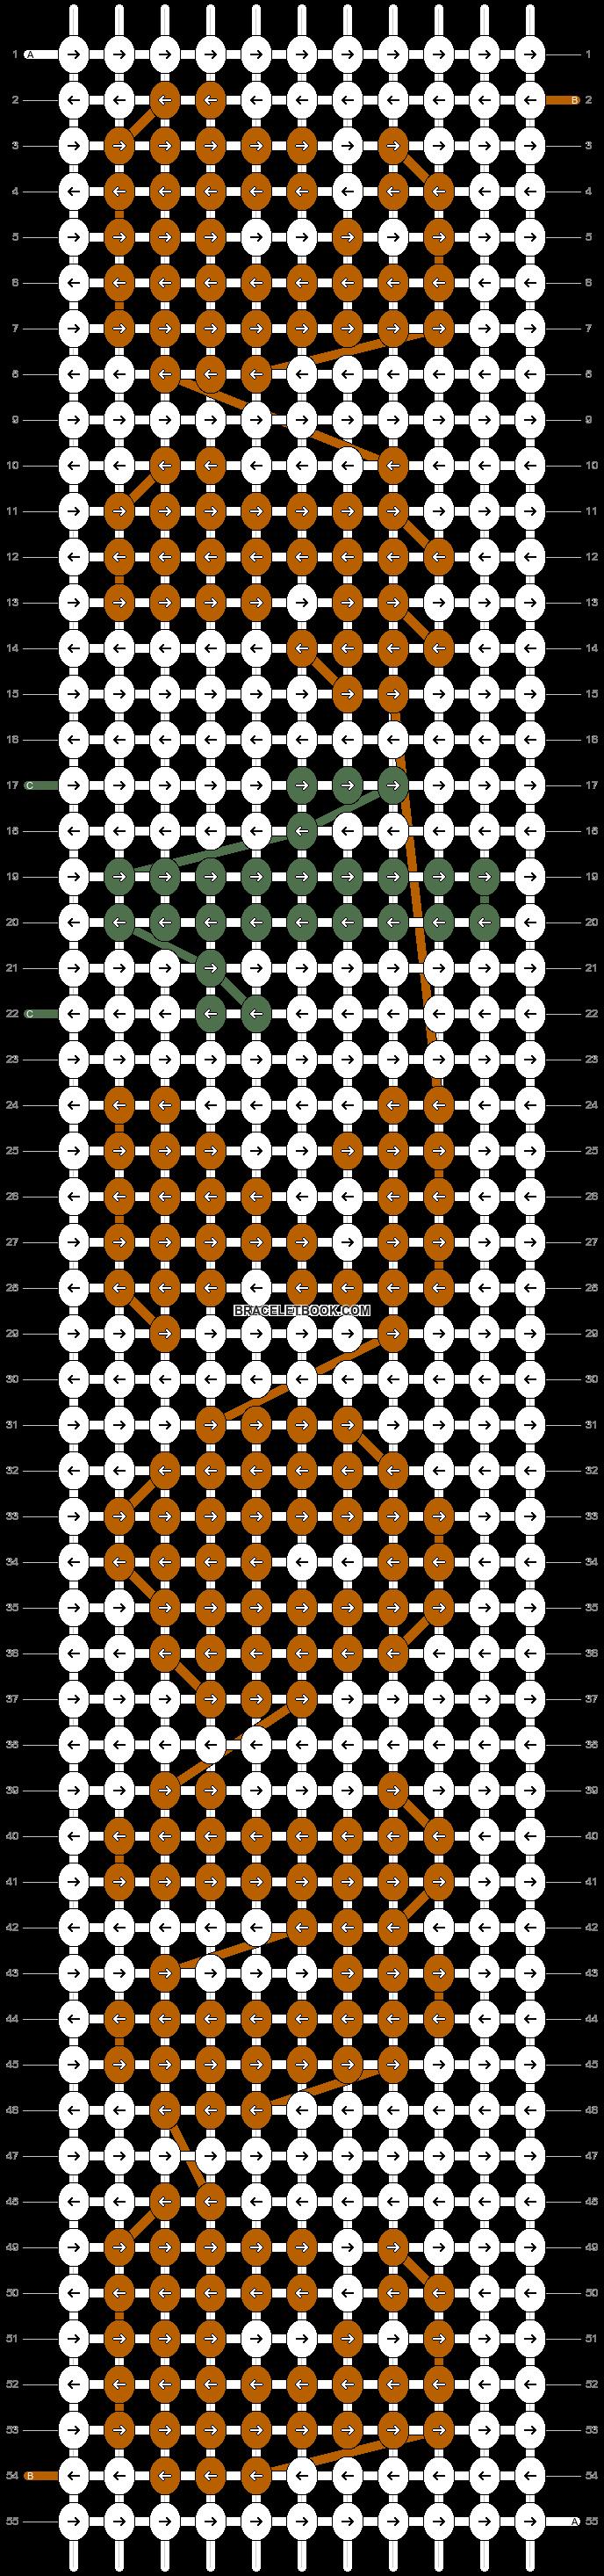 Alpha pattern #54226 pattern